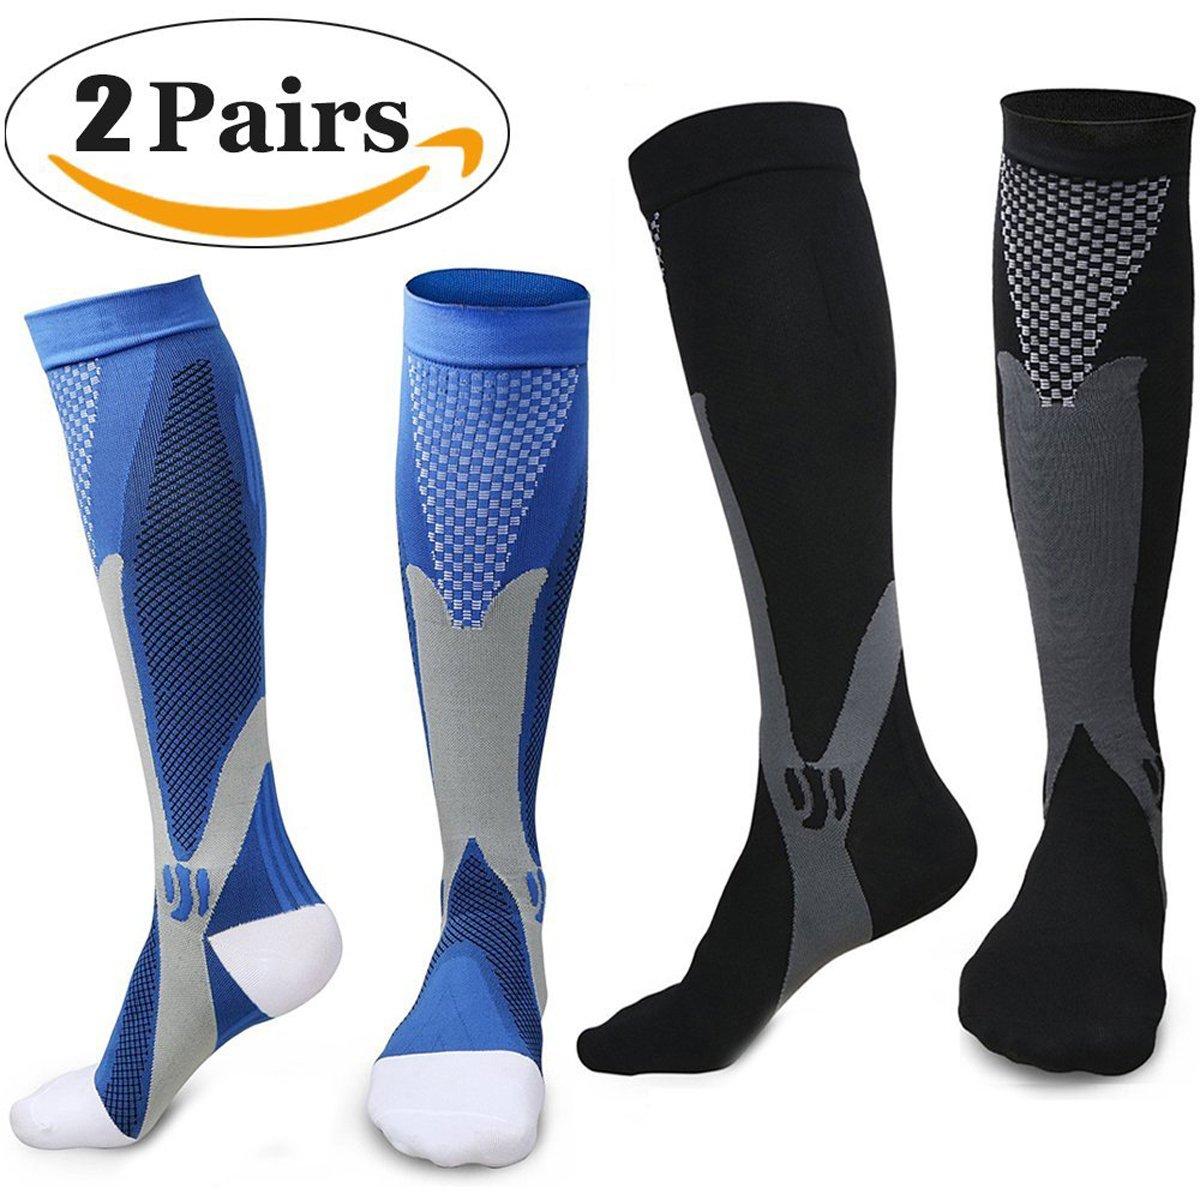 Sintiz Compression Socks for Men & Women (20-30mmHg),Knee High Stockings Graduated Support Athletic Running Pregnancy Health Travel Edema Diabetic Flight Nurses & Recovery Black + Blue S/M